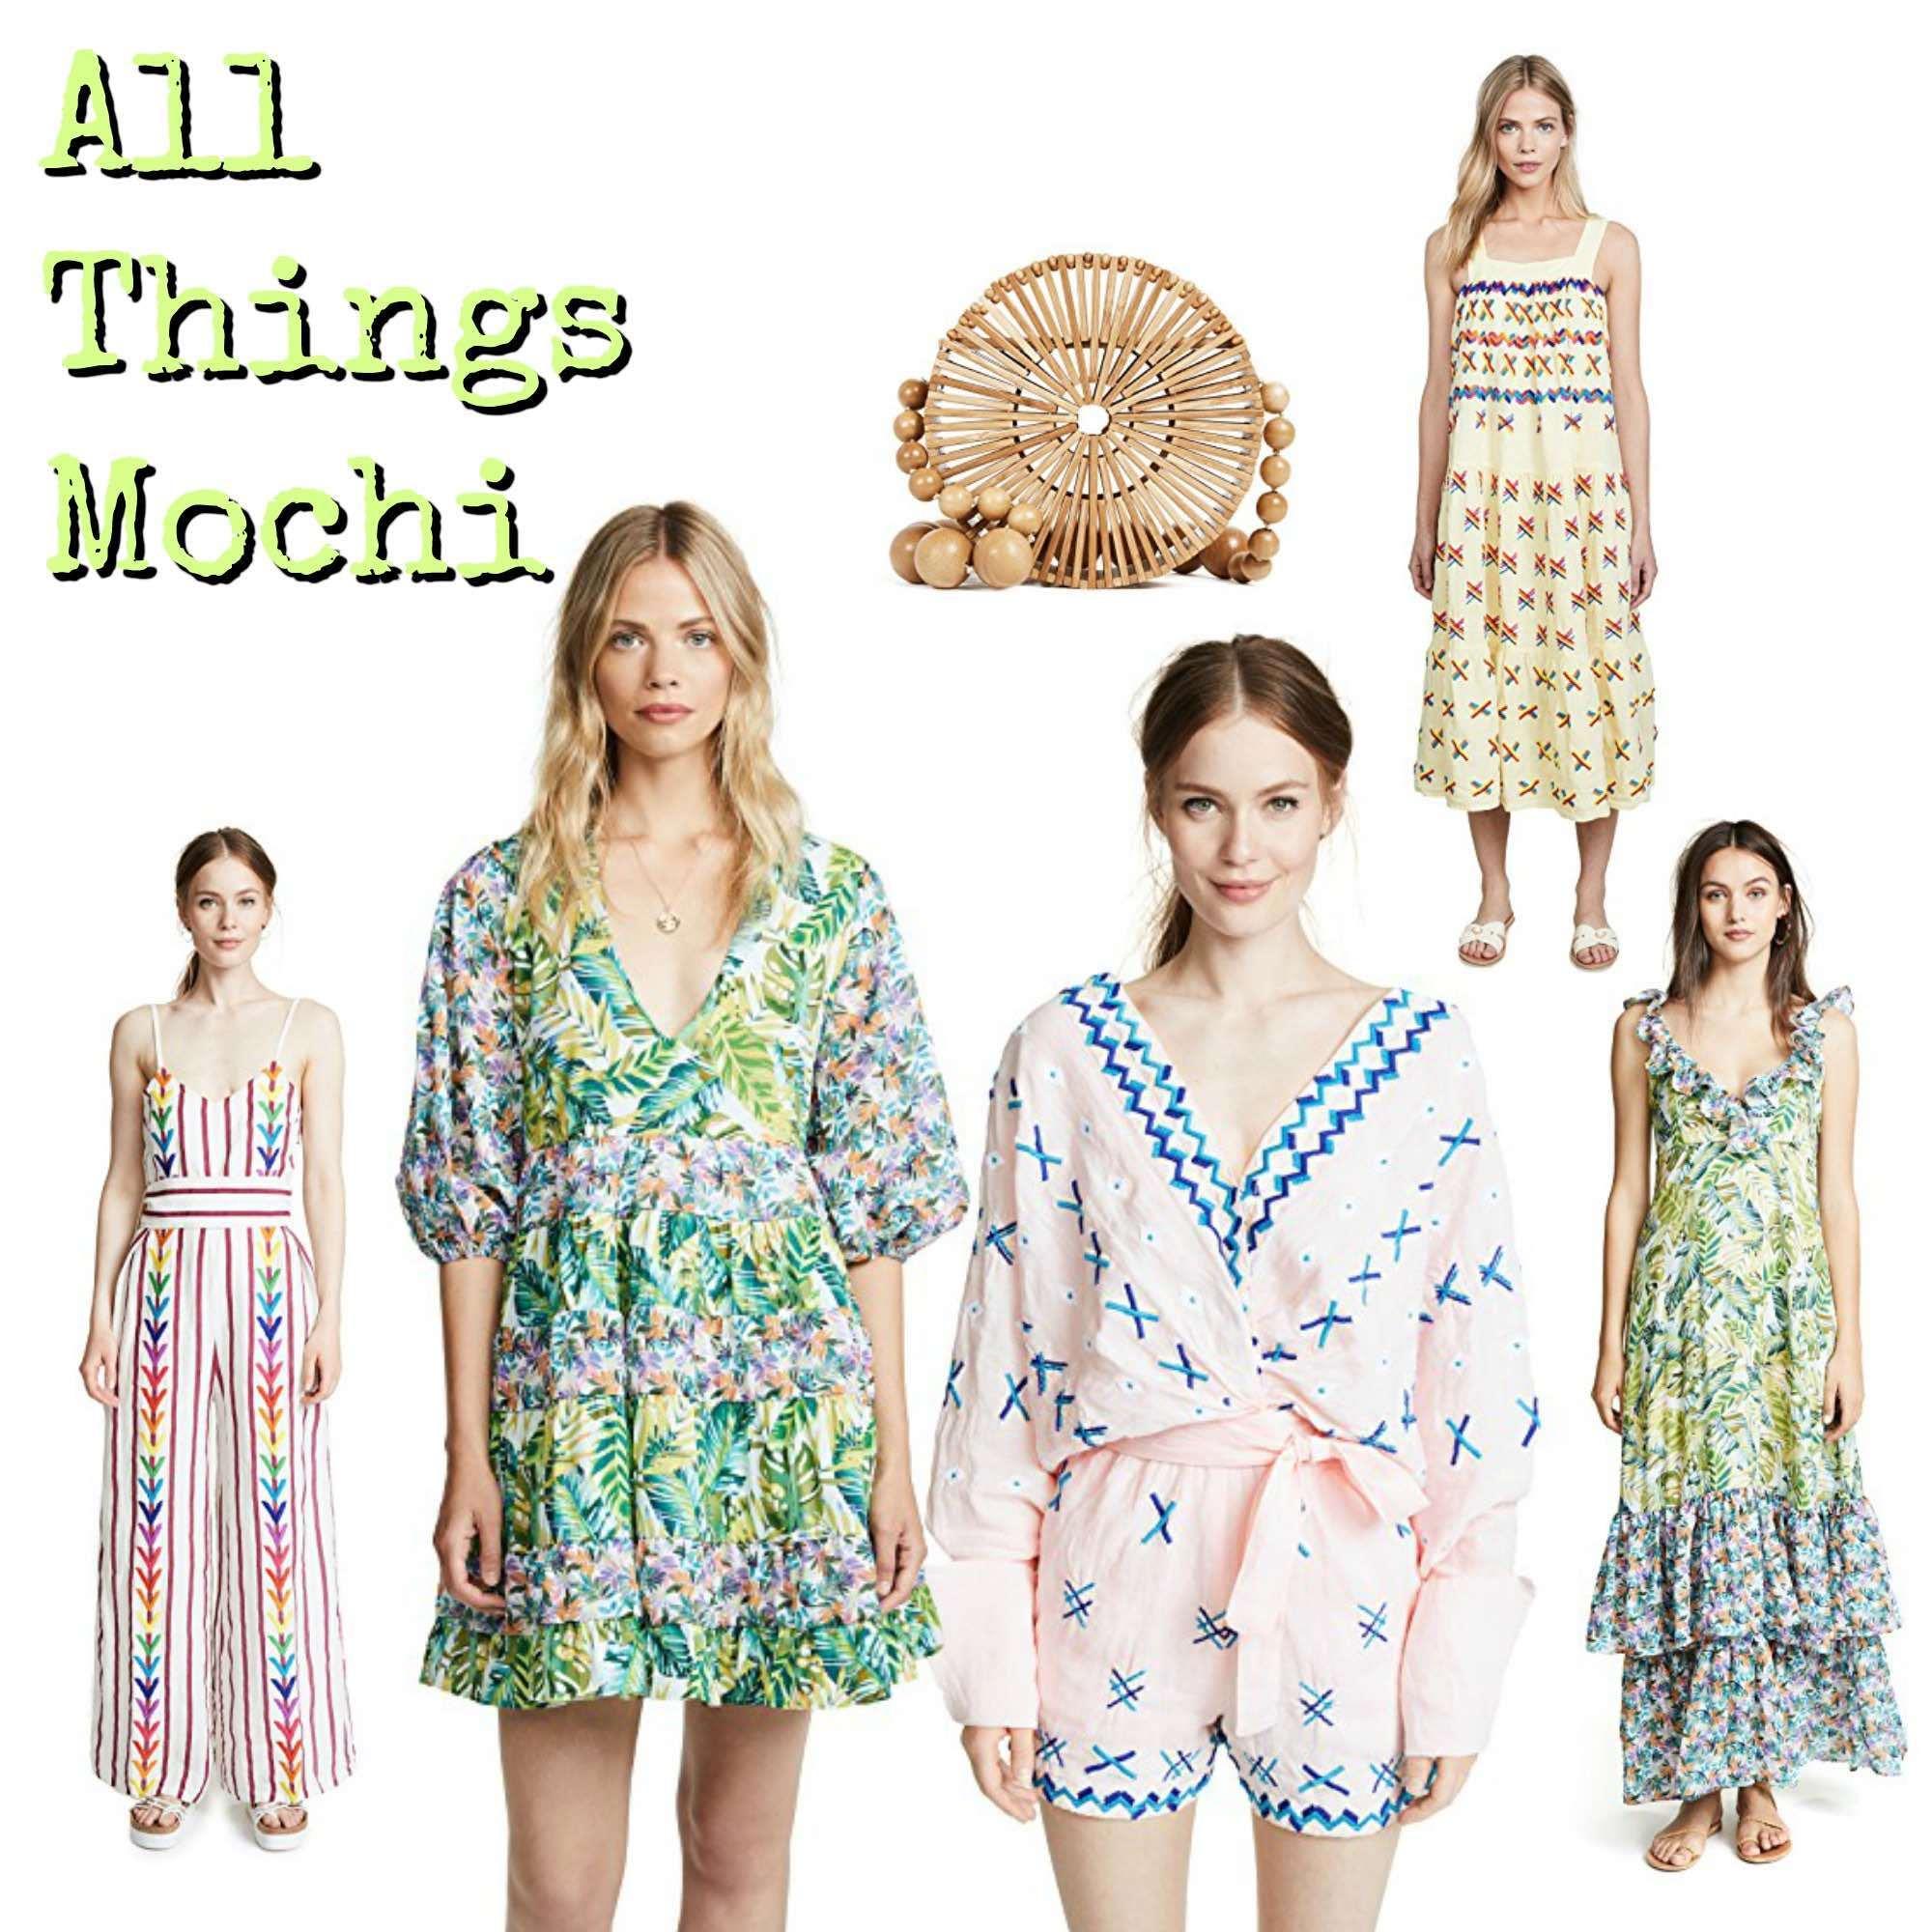 All Things Mochi - Shopbop